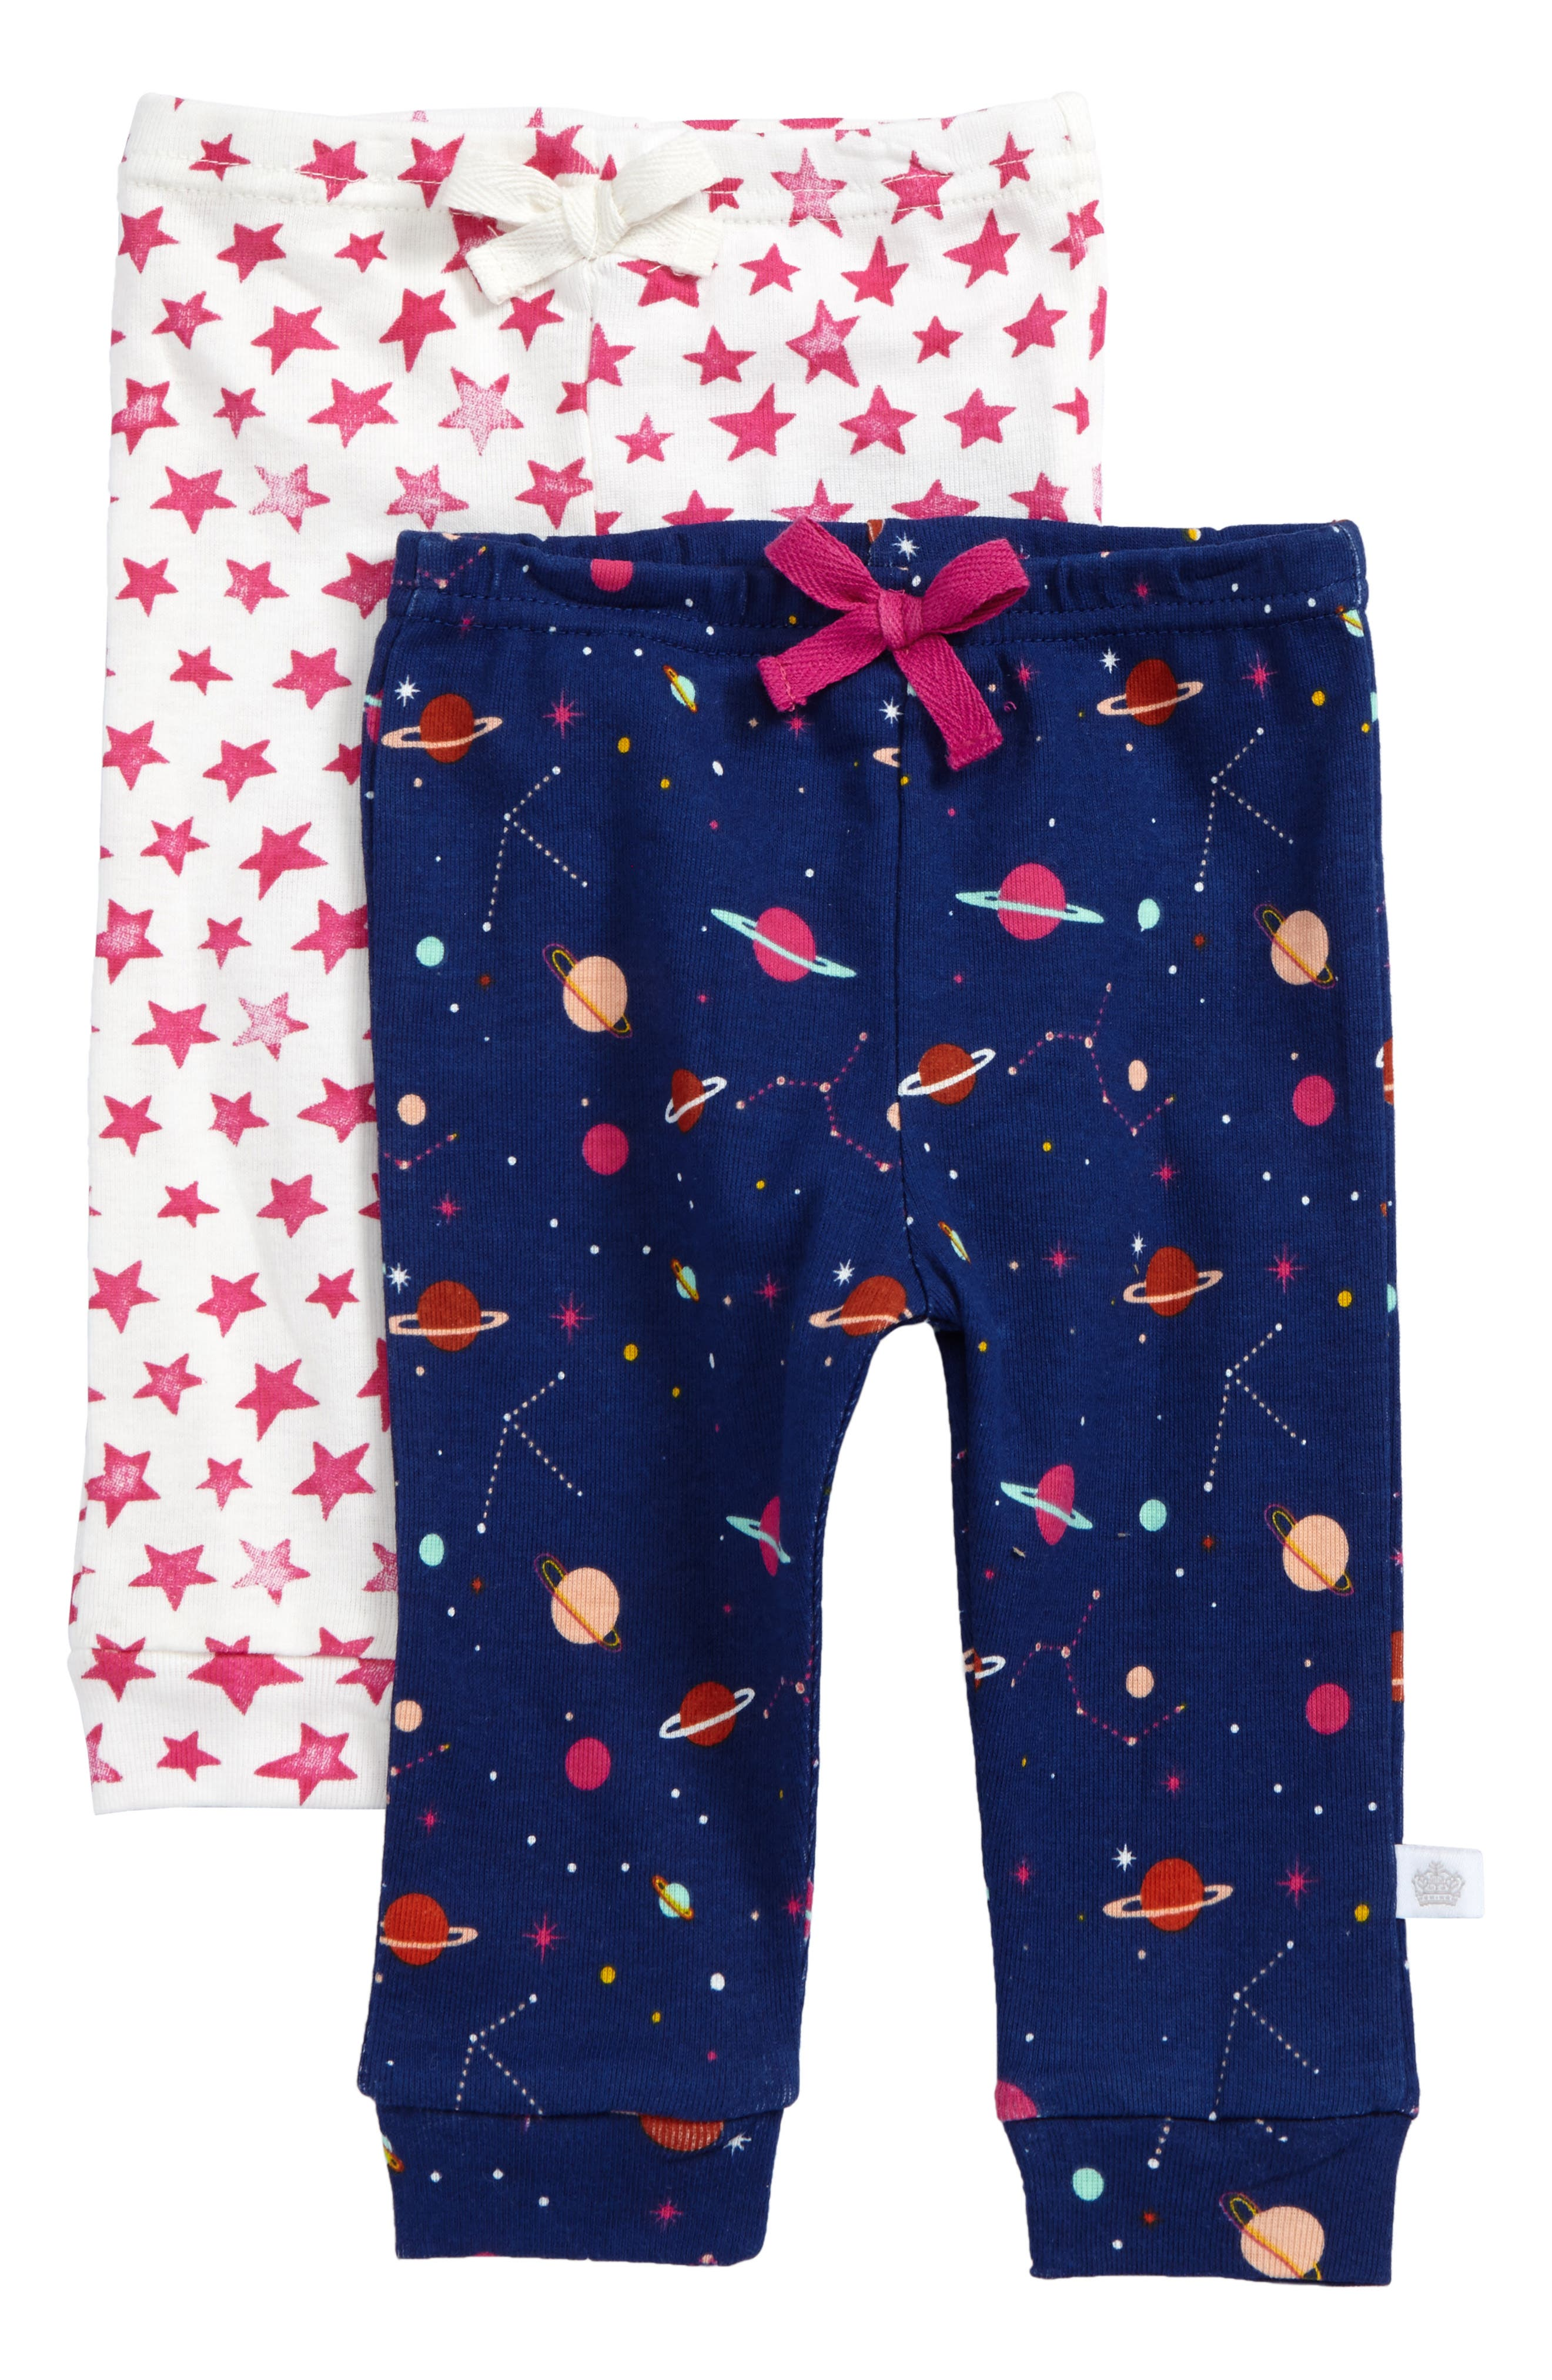 Rosie Pope Planets & Stars 2-Pack Leggings (Baby Girls)